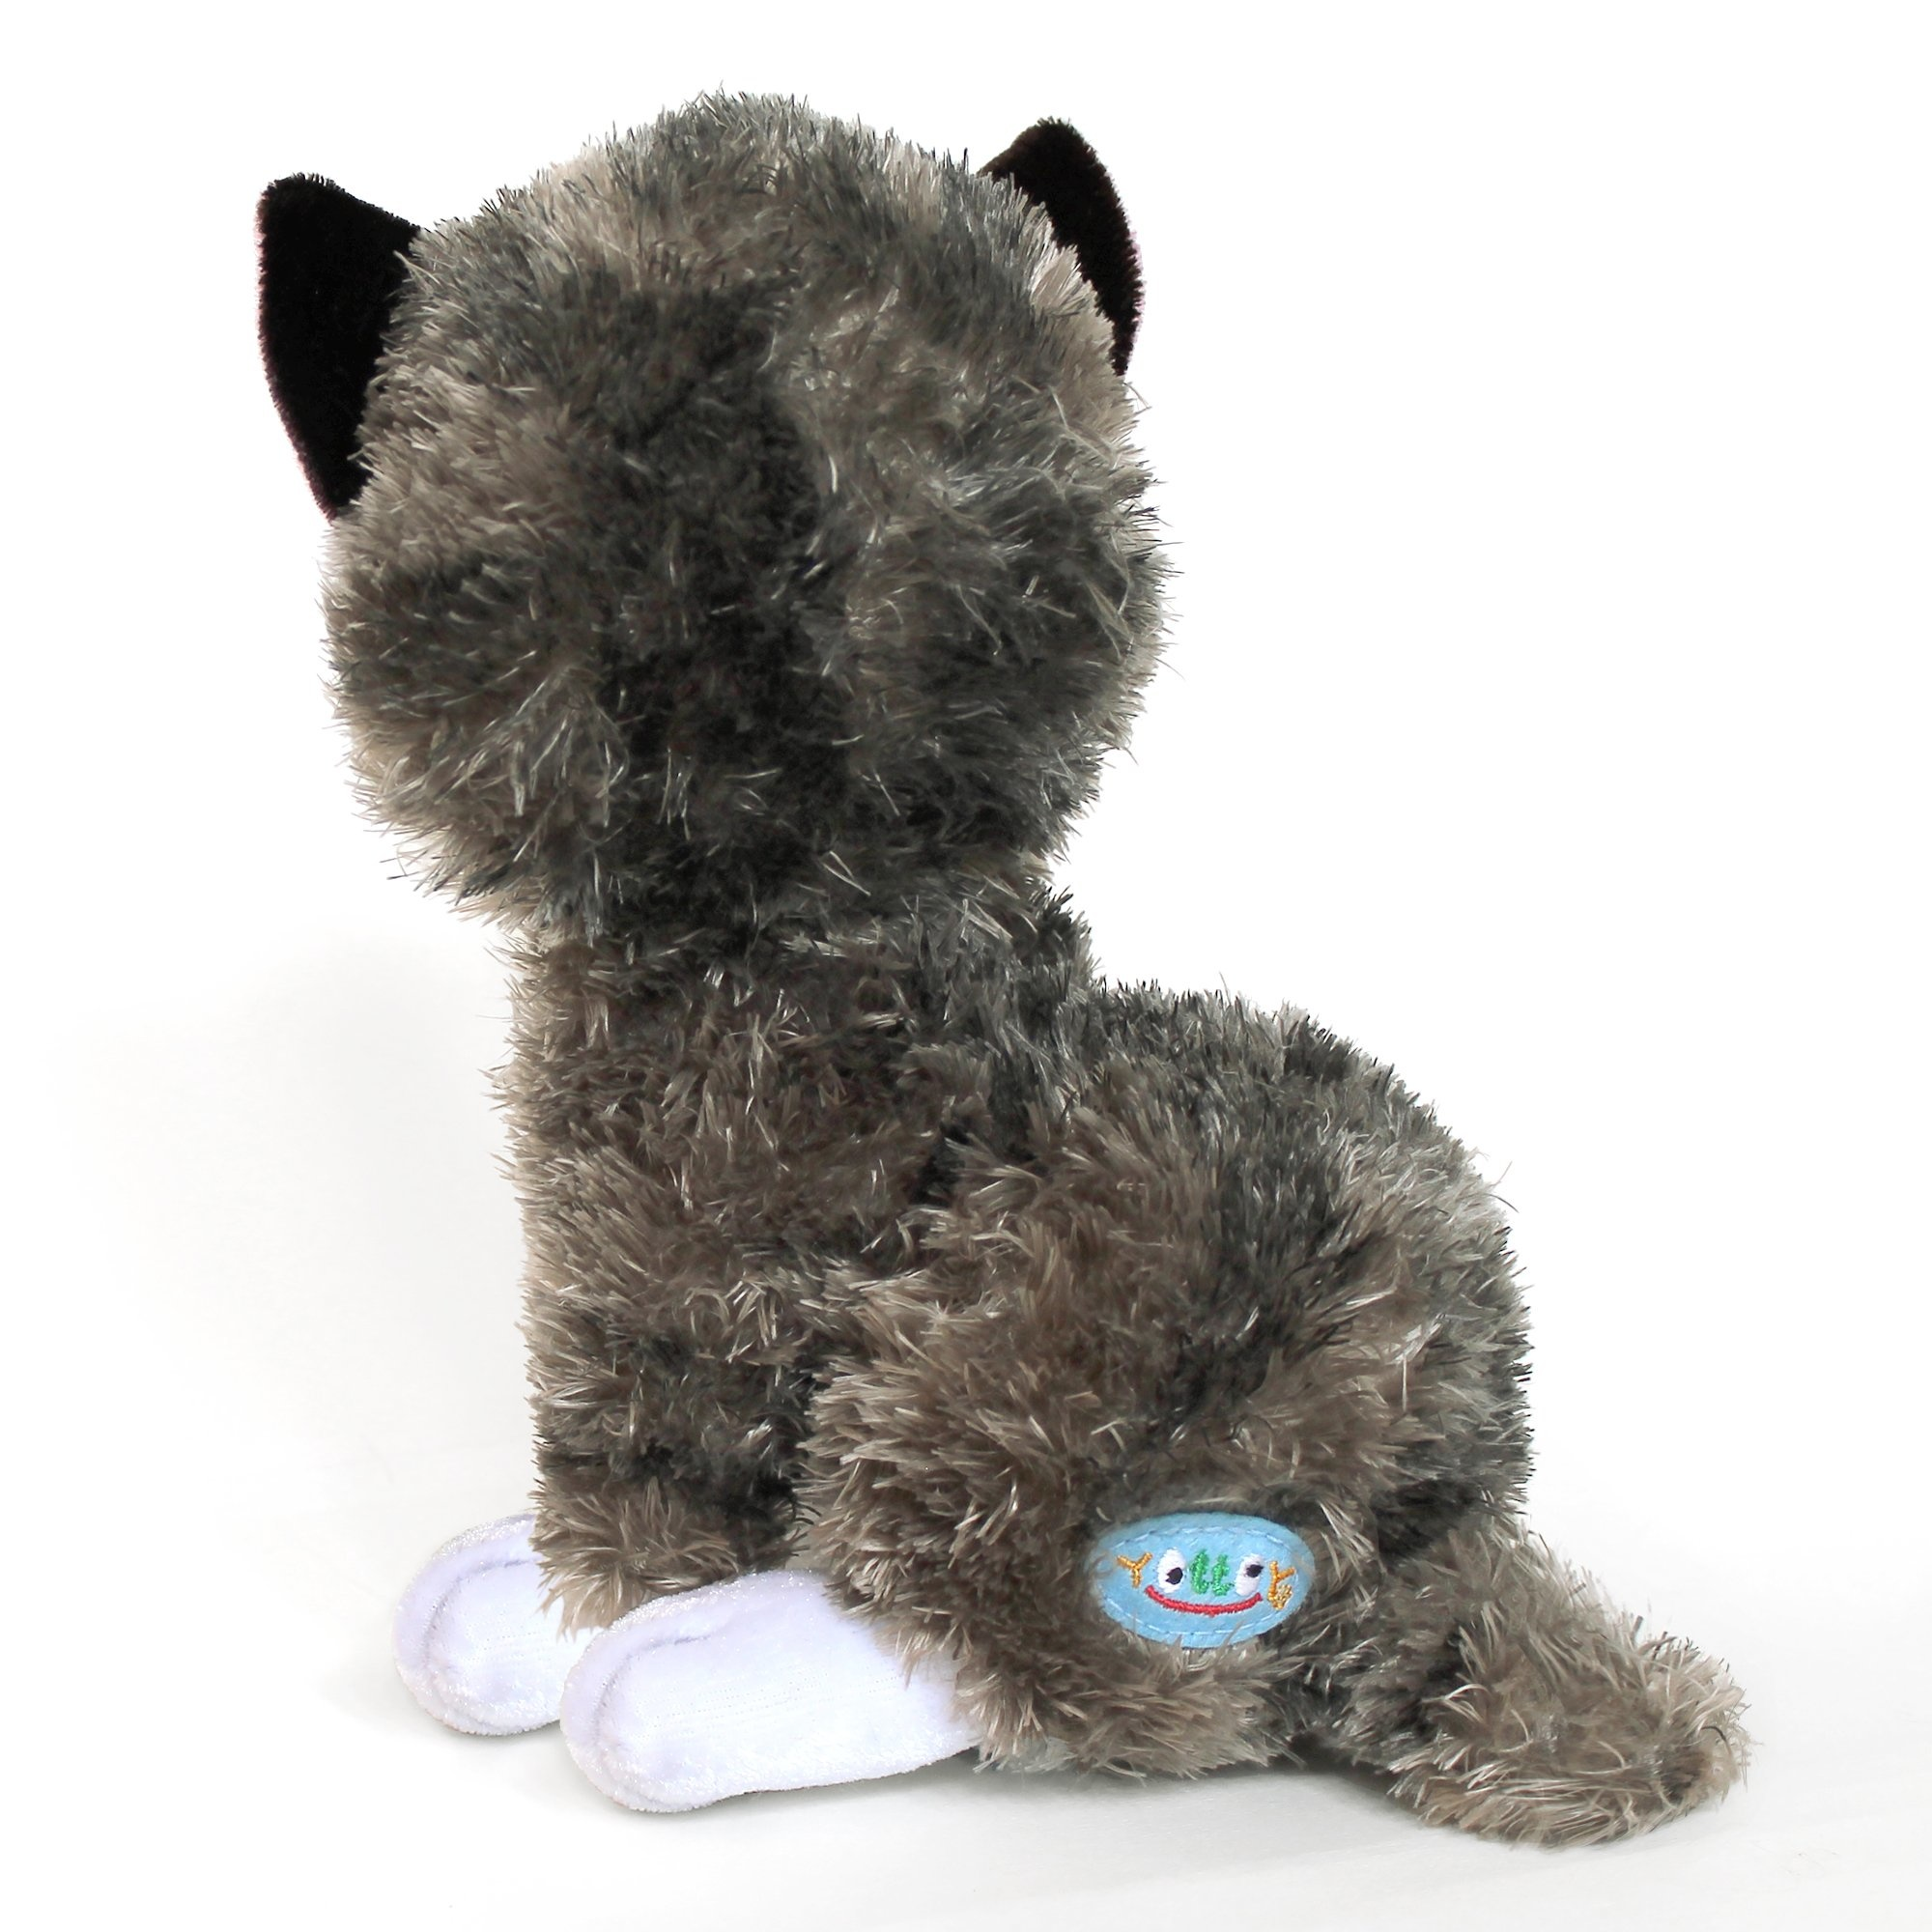 Yottoy Shy Little Kitten Soft Toy